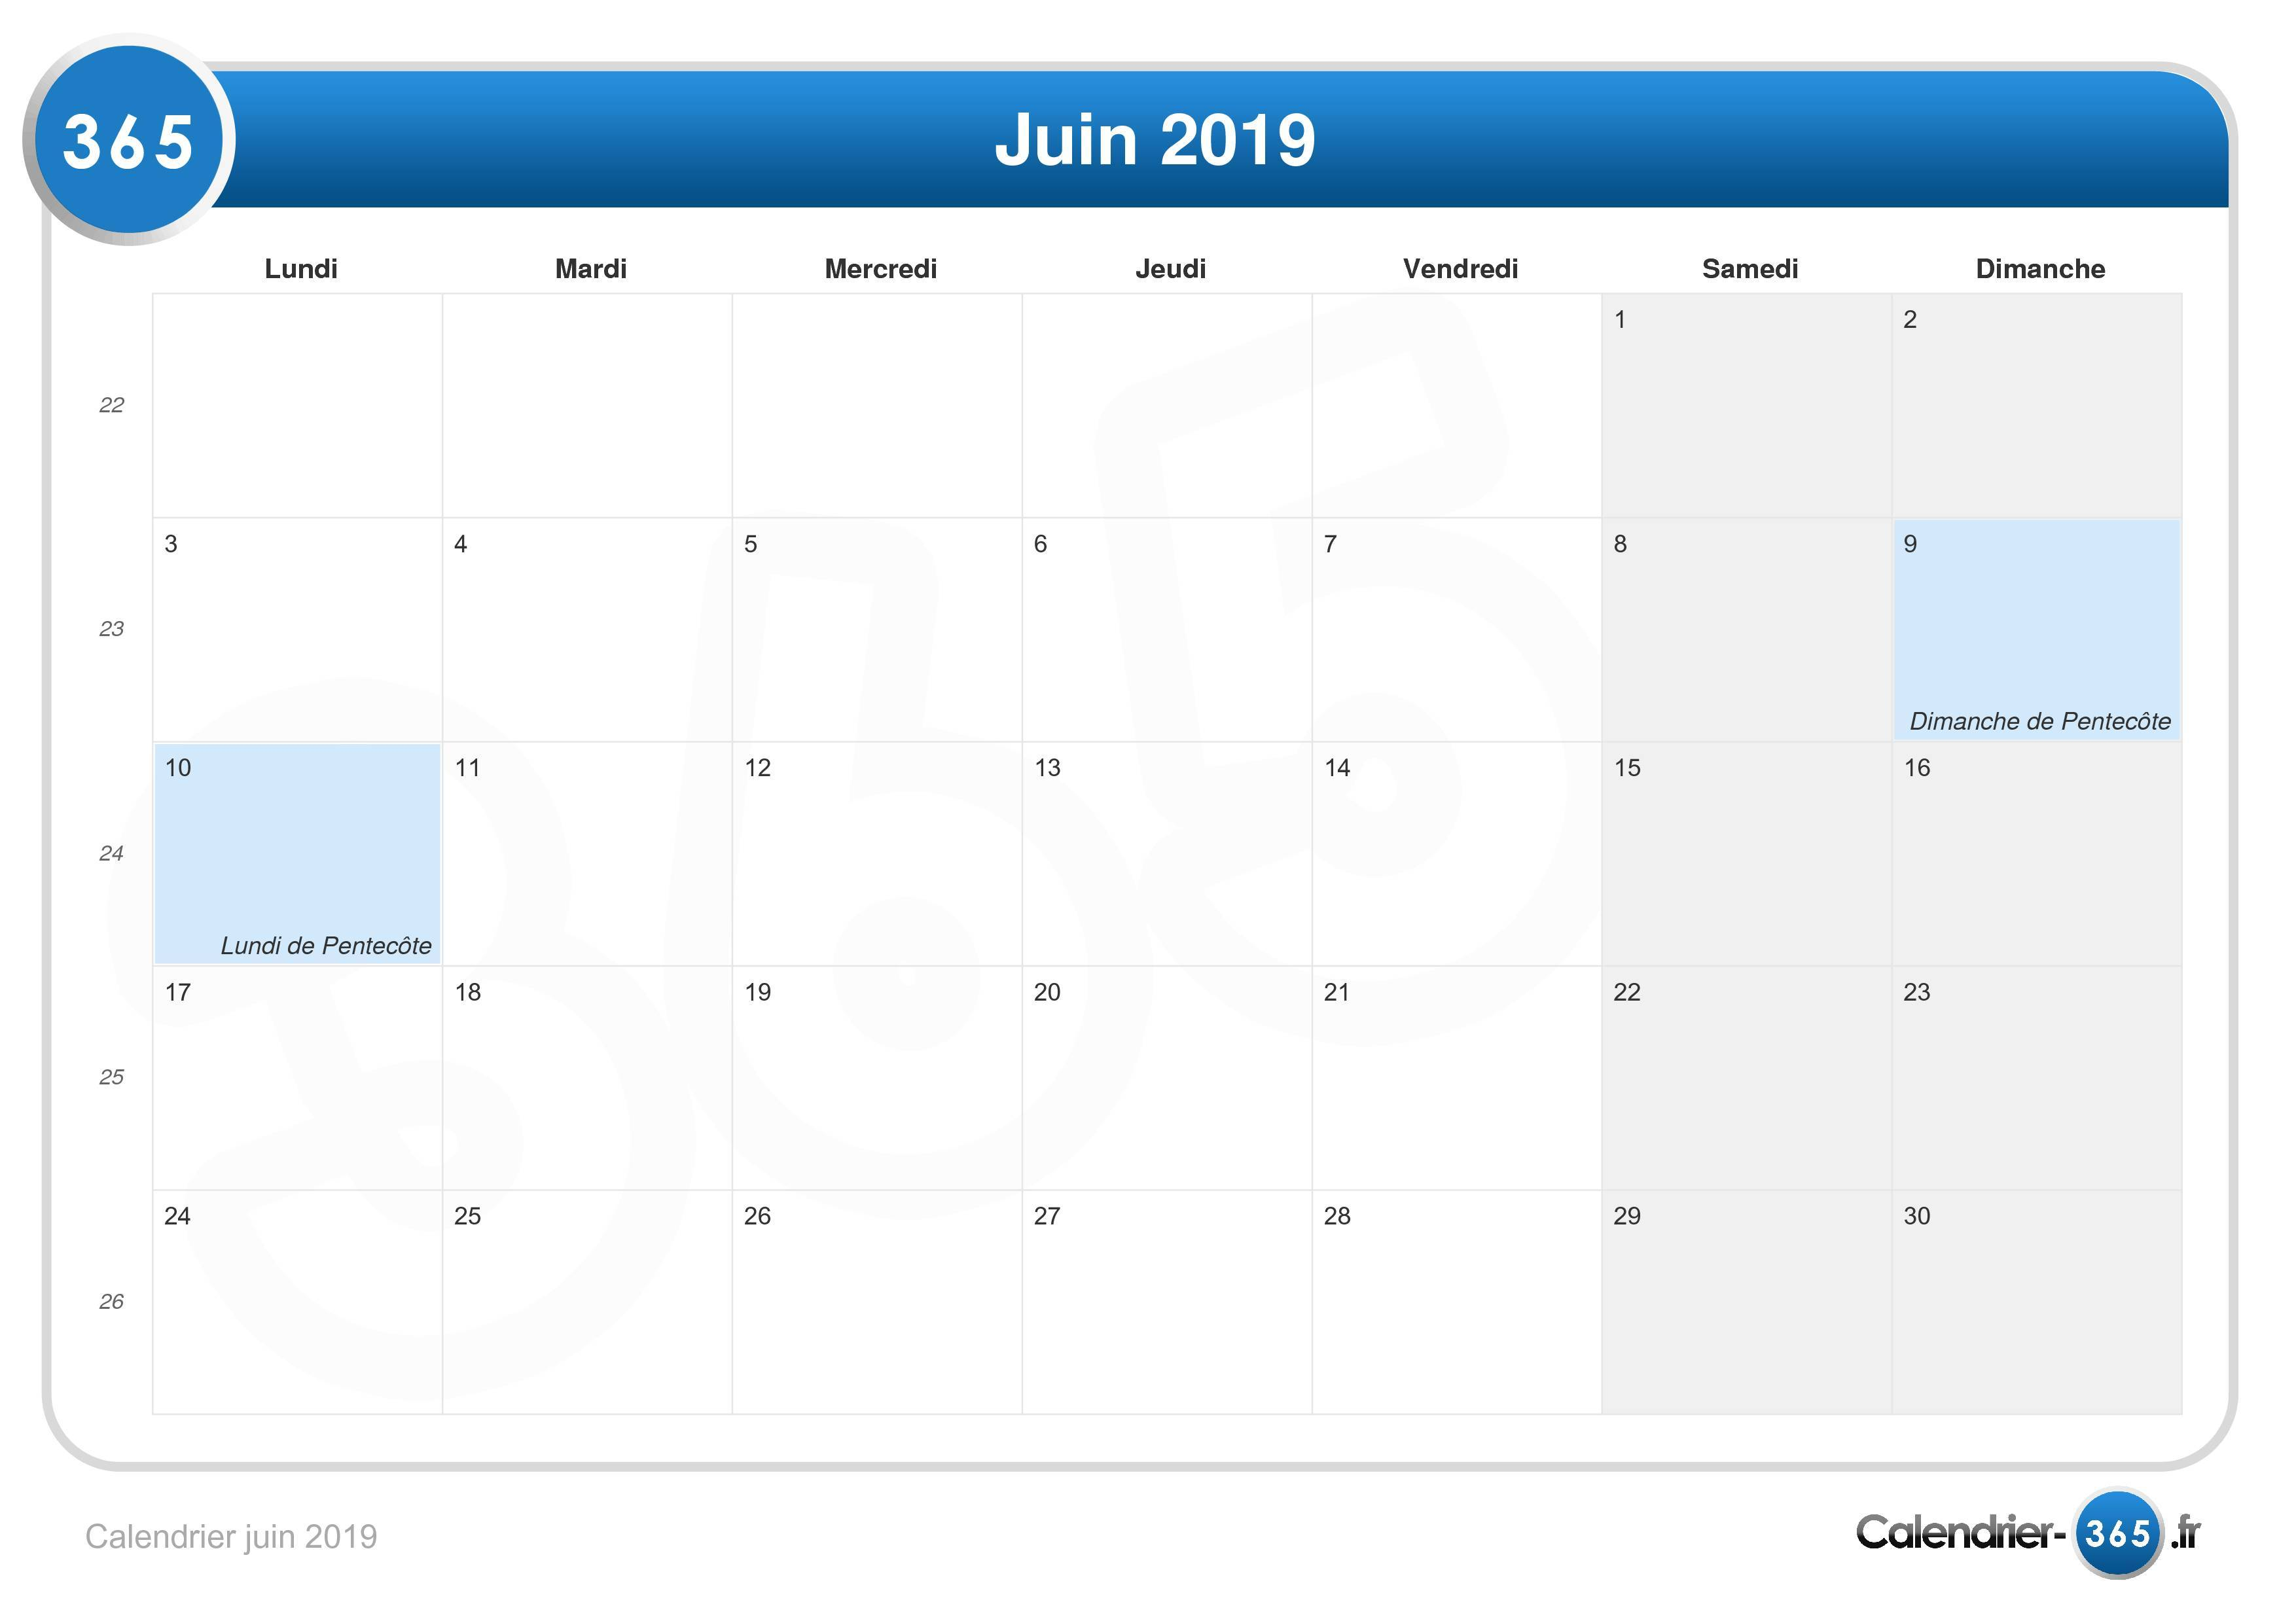 Semaine 2019 Calendrier.Calendrier Juin 2019